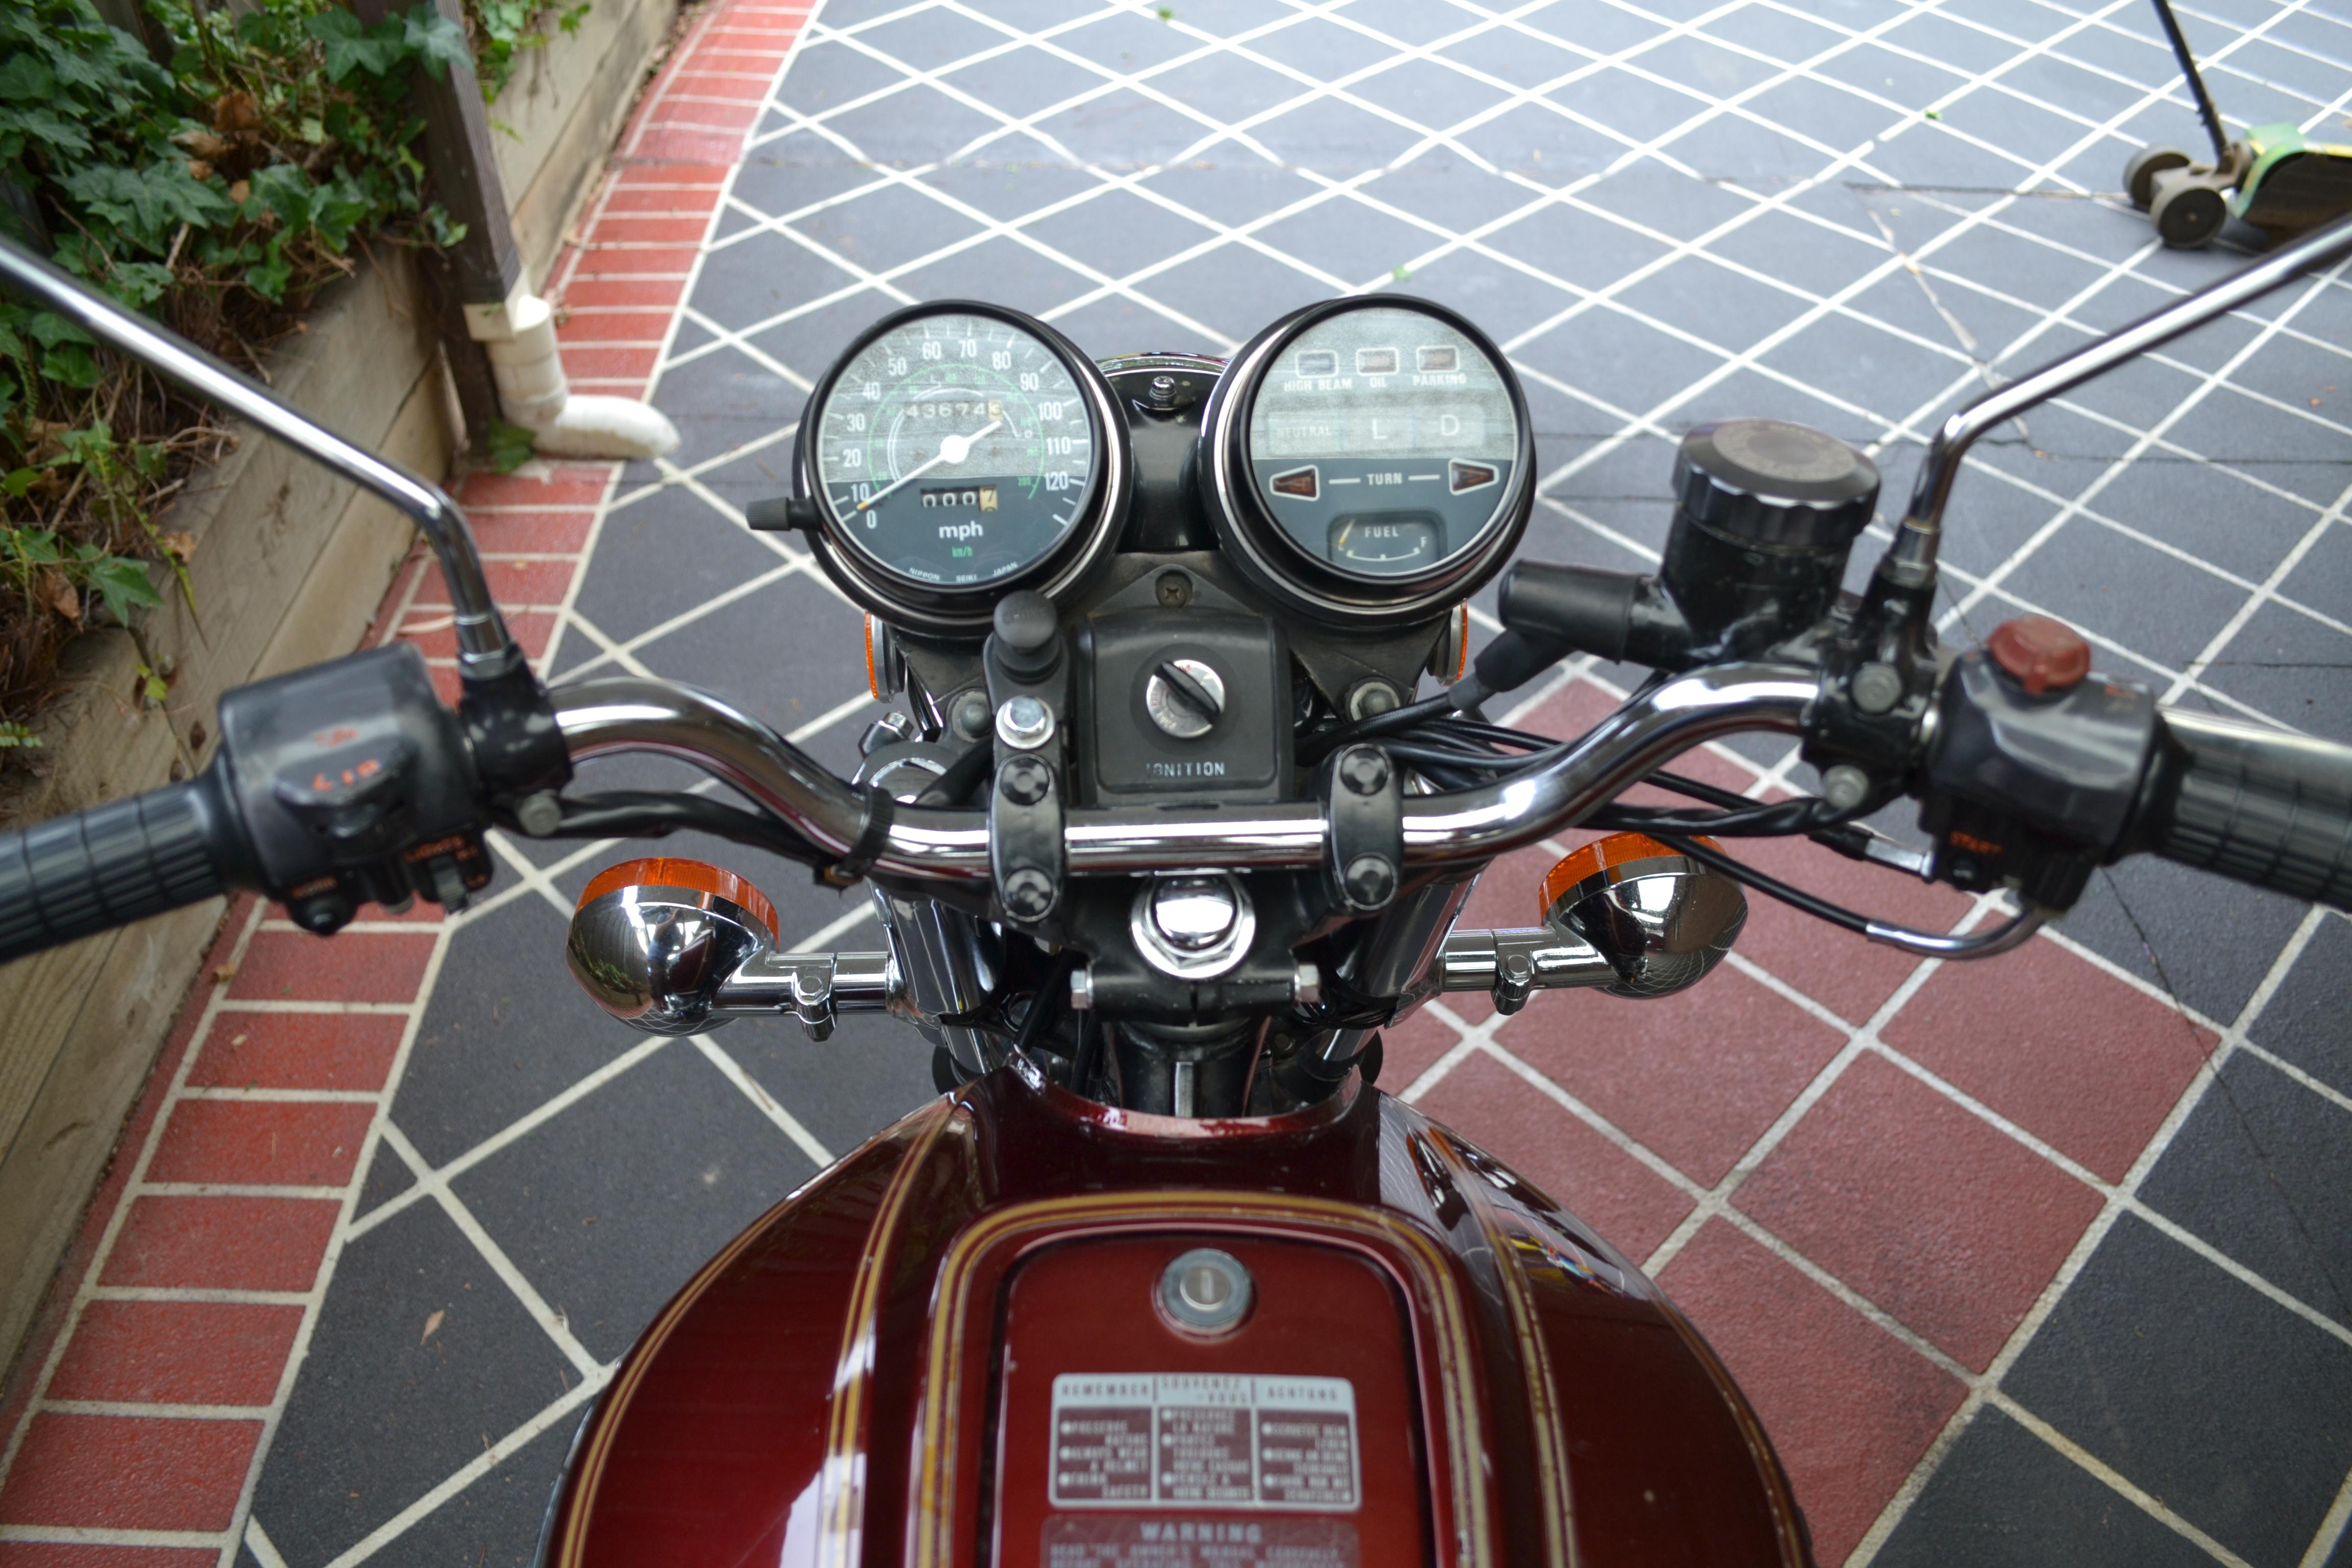 Best motorcycle handlebars - Dsc_0281